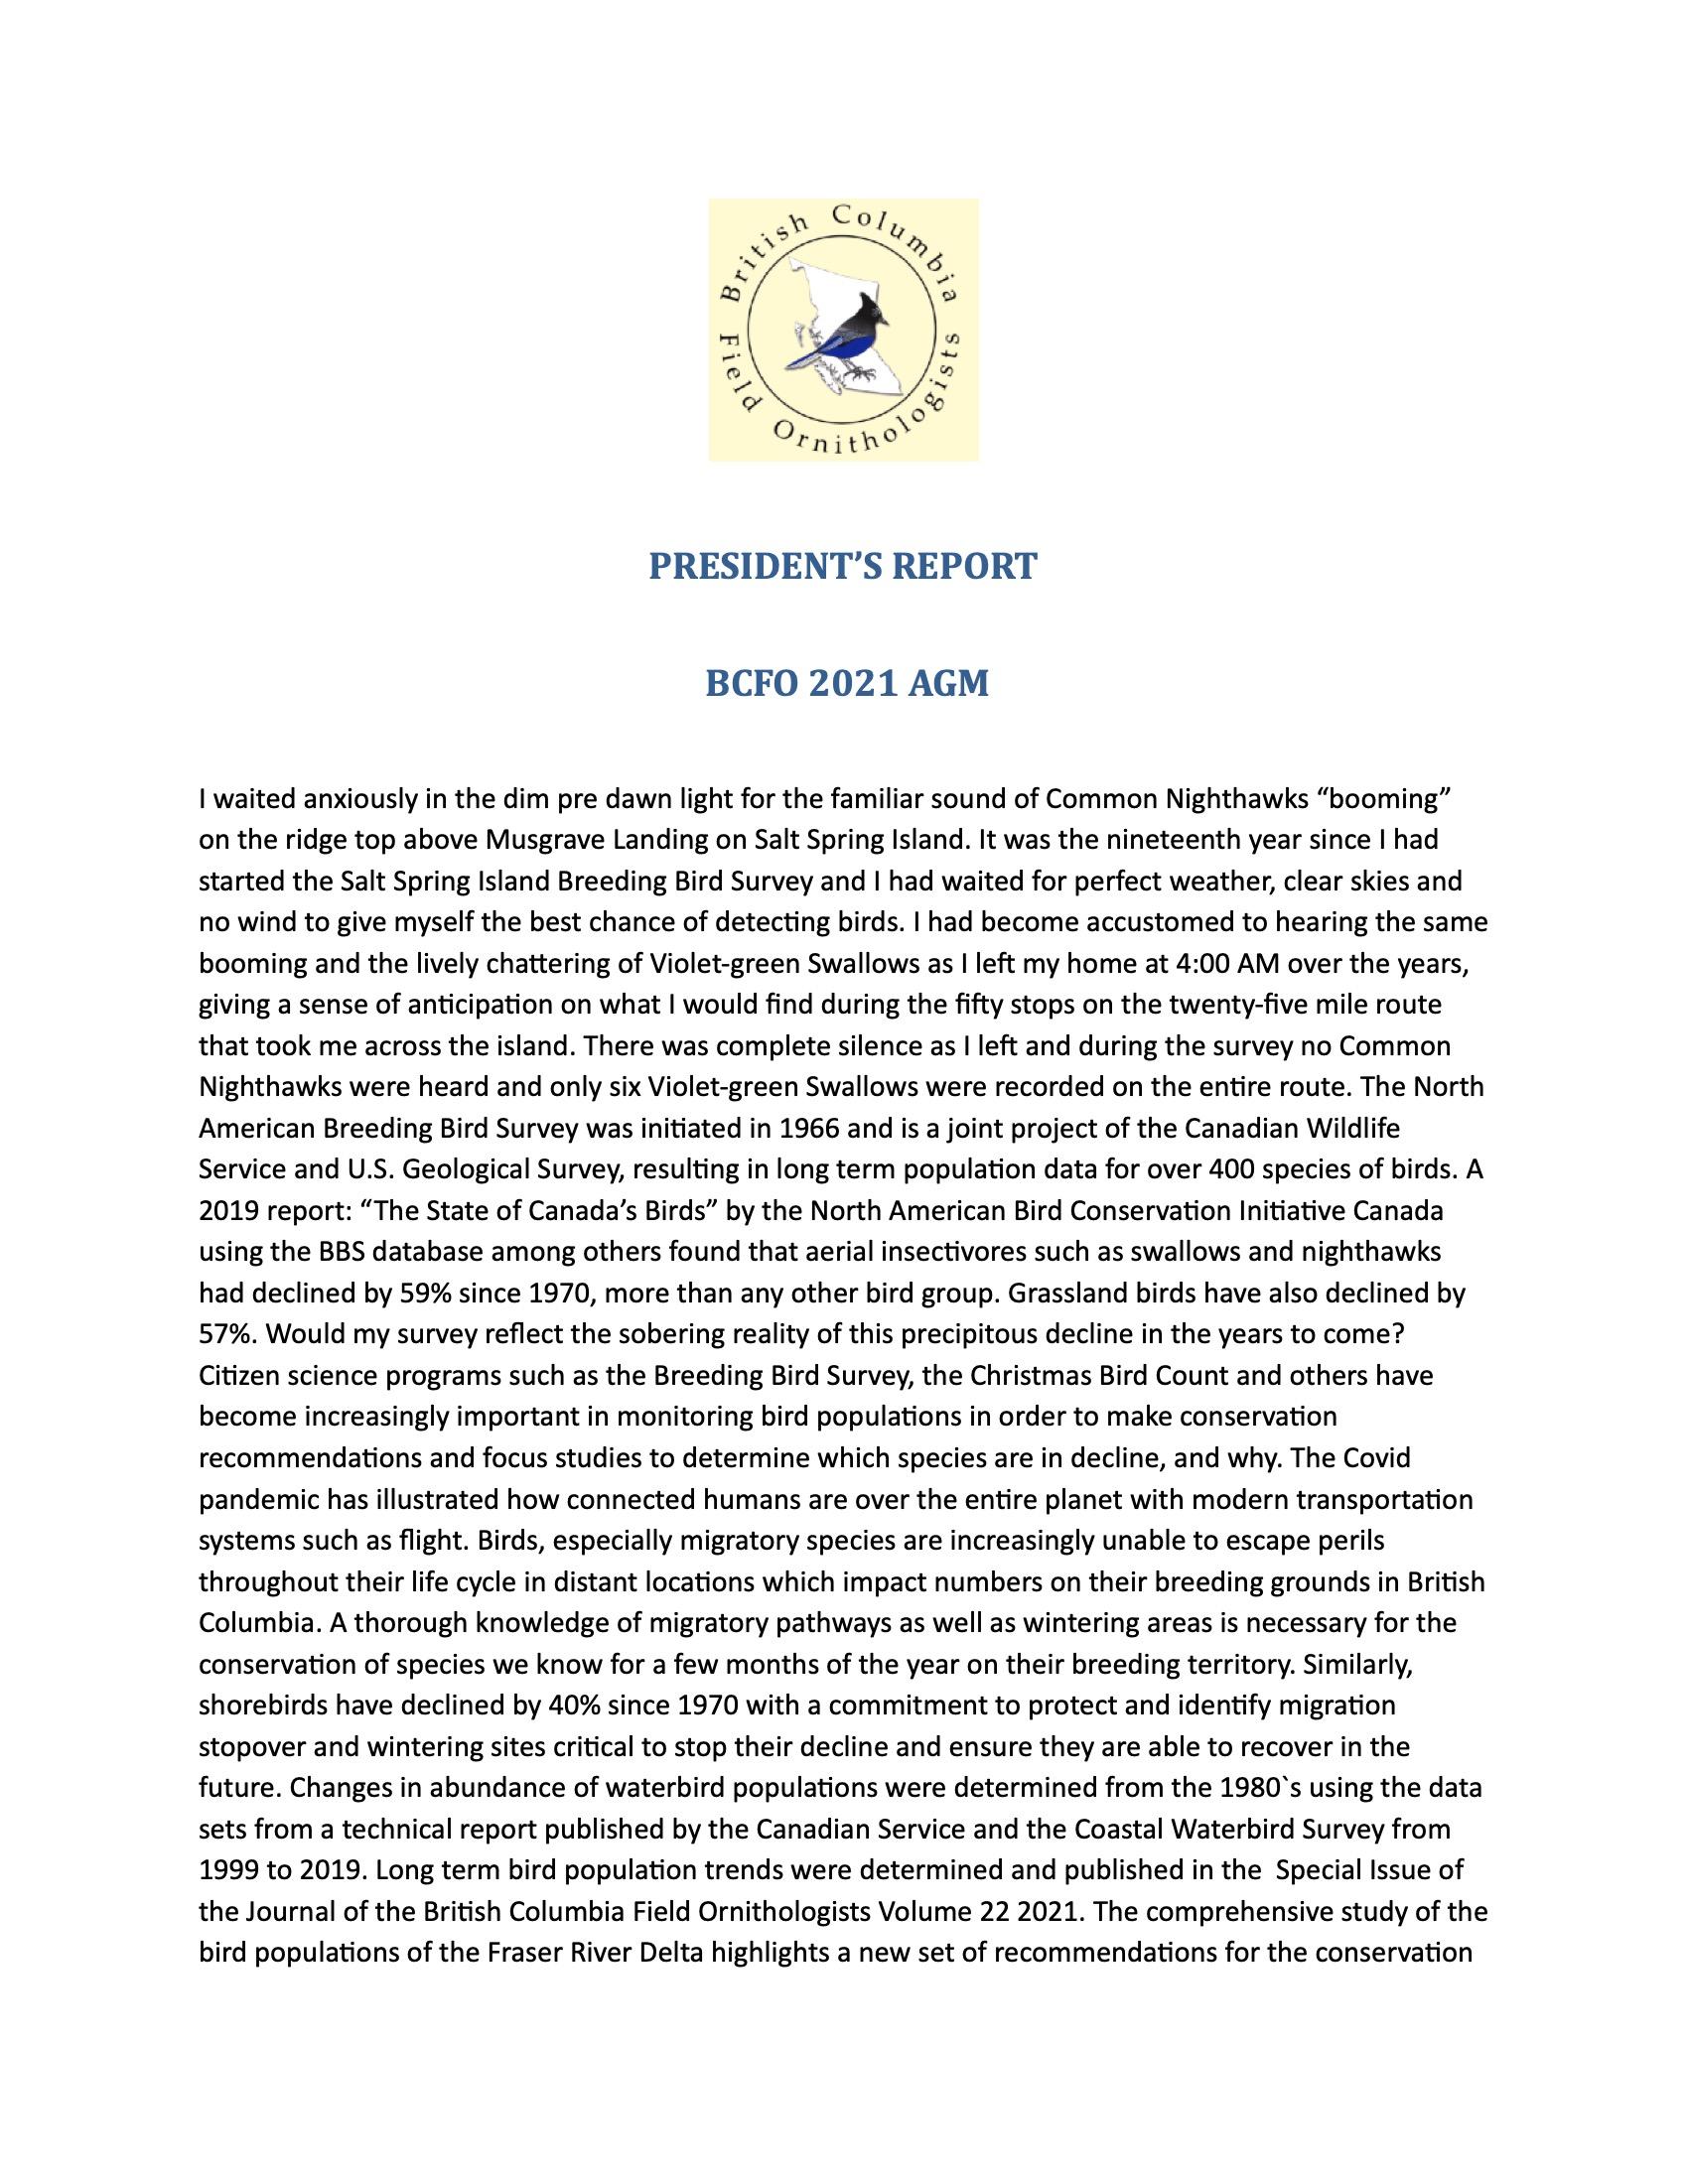 President's Report BCFO 2021 AGM-F -1